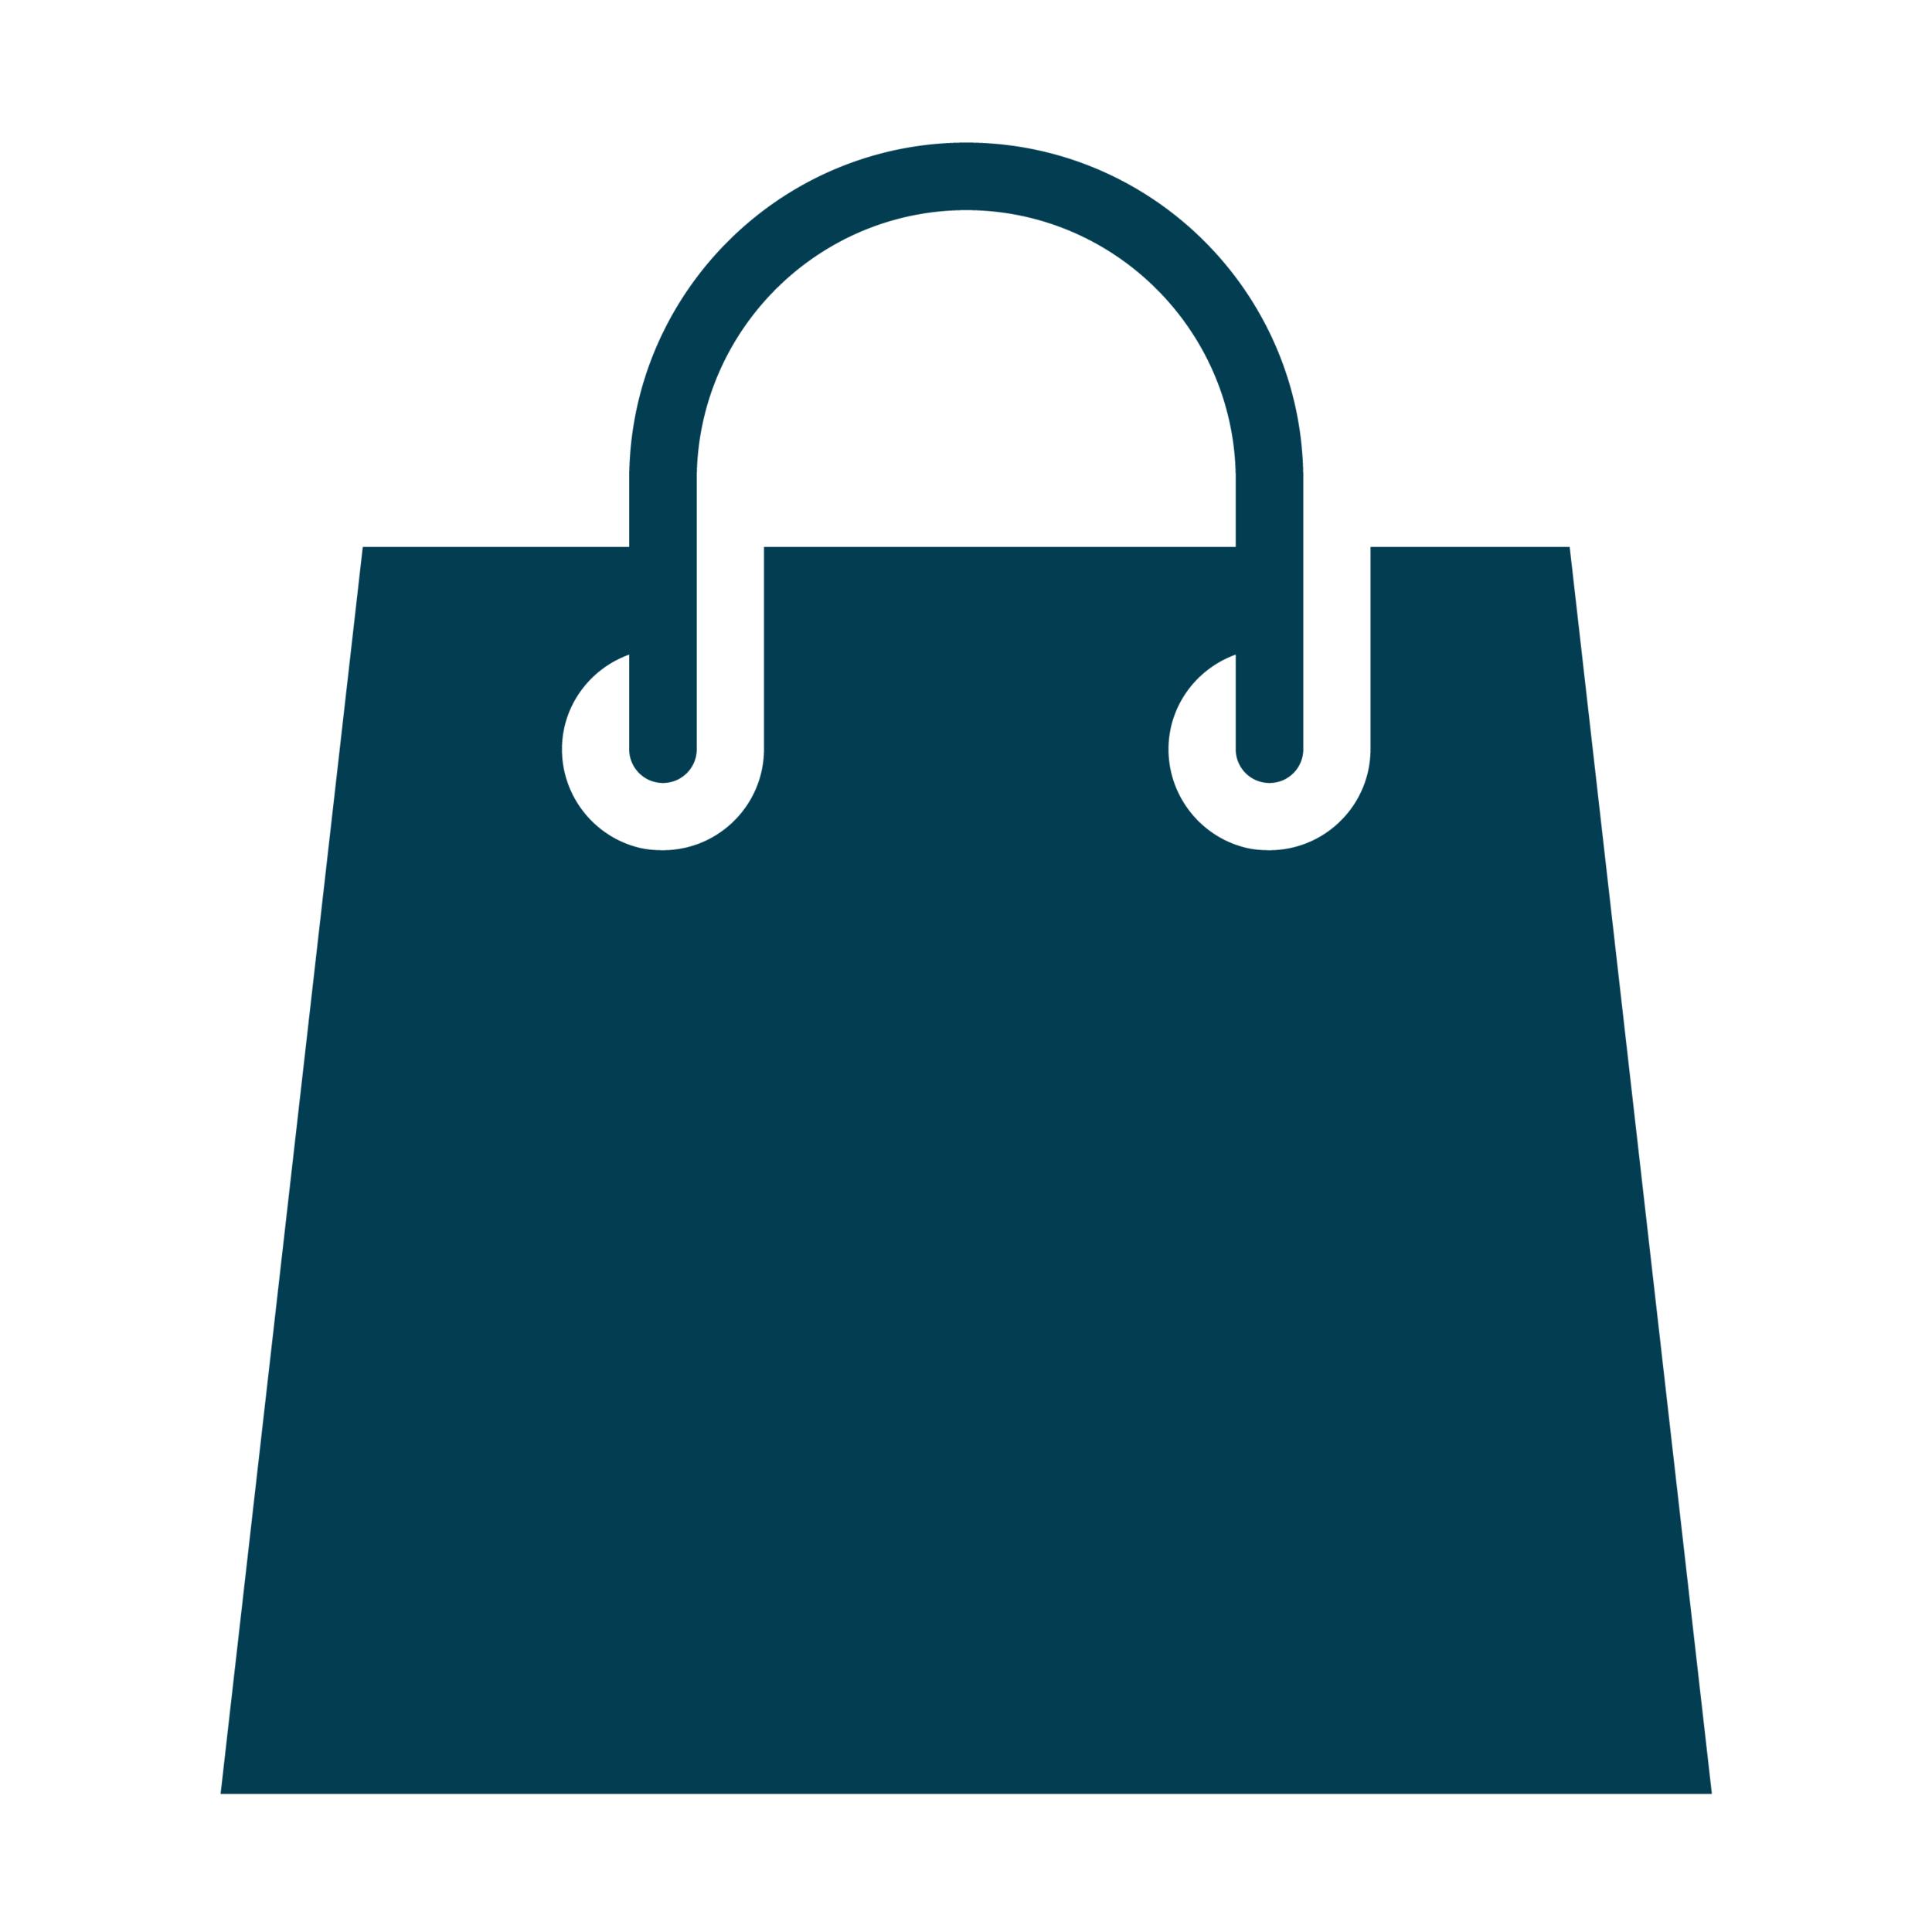 Shoppingbag-01.png